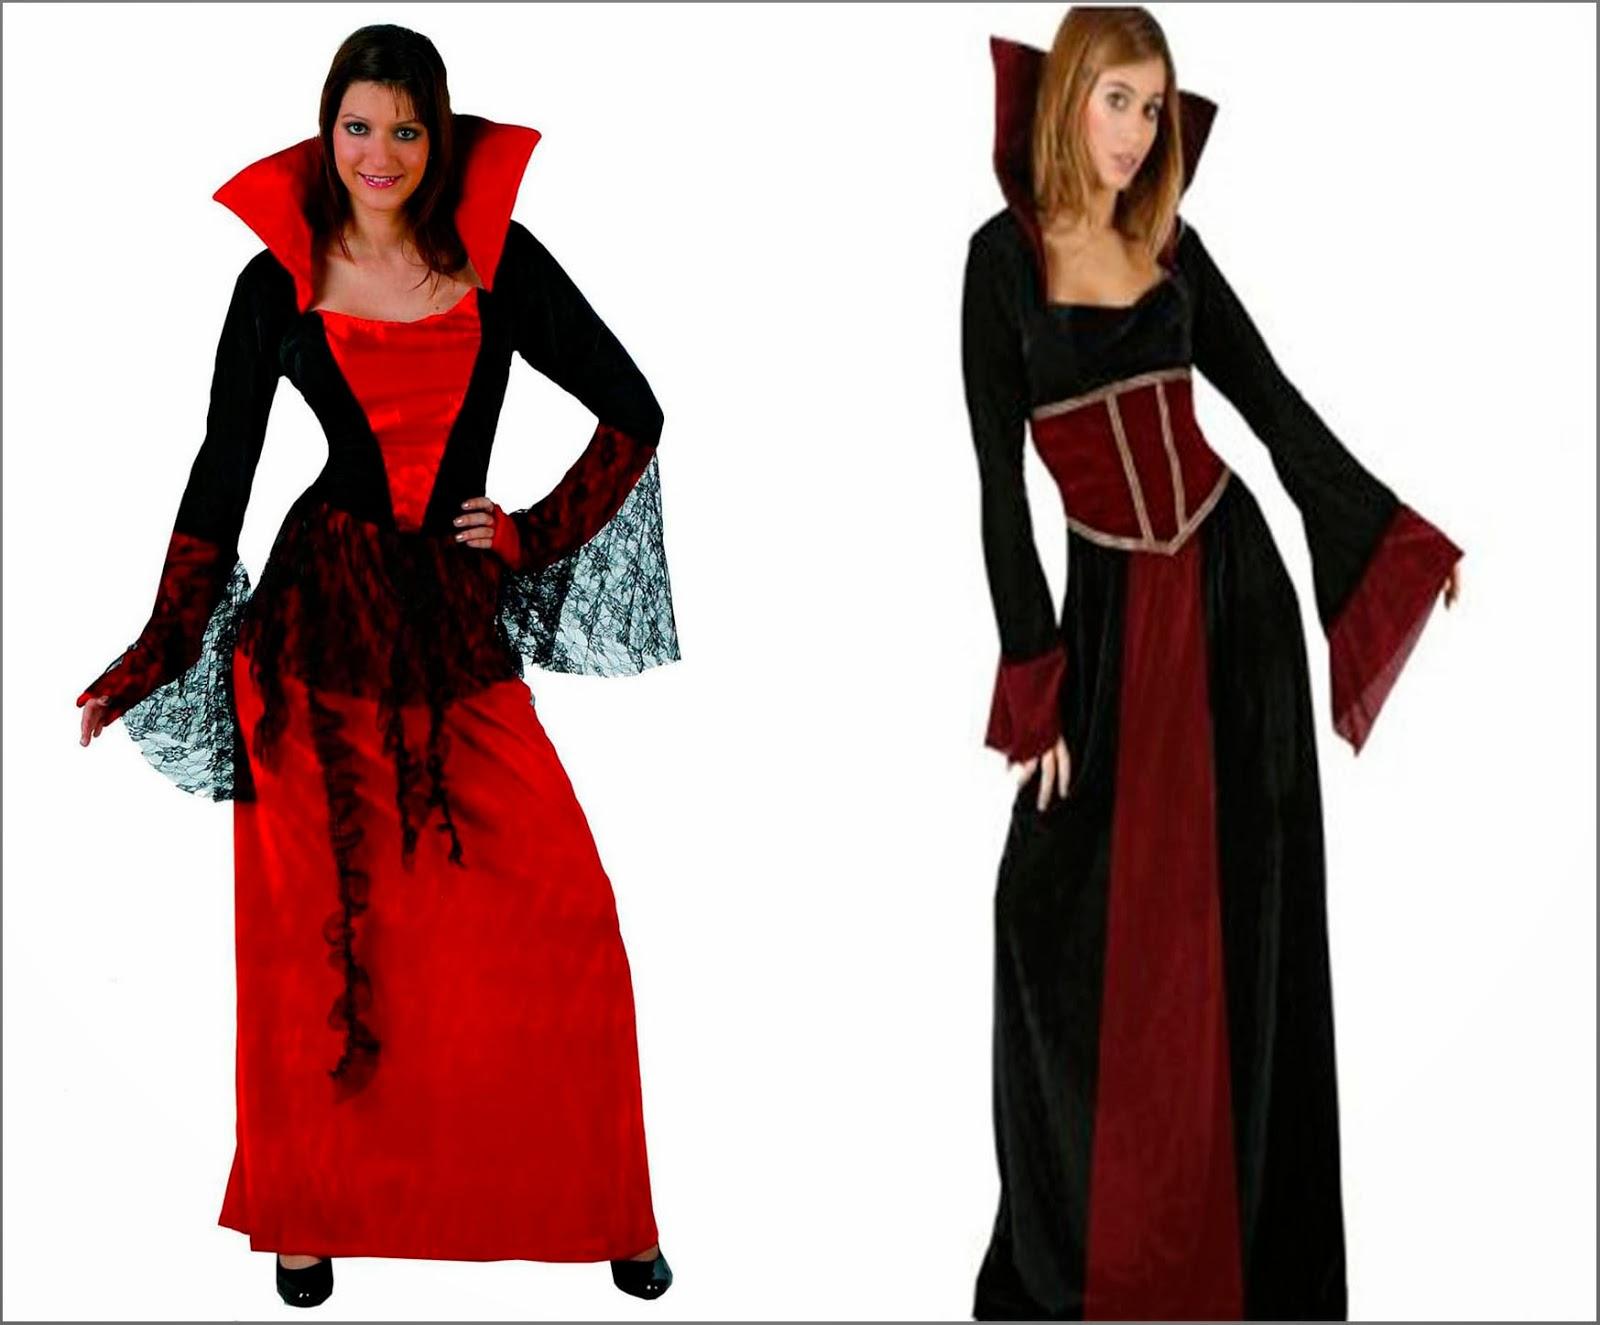 Trendy in the sky disfraces halloween de miedo baratos 2013 for Disfraces baratos